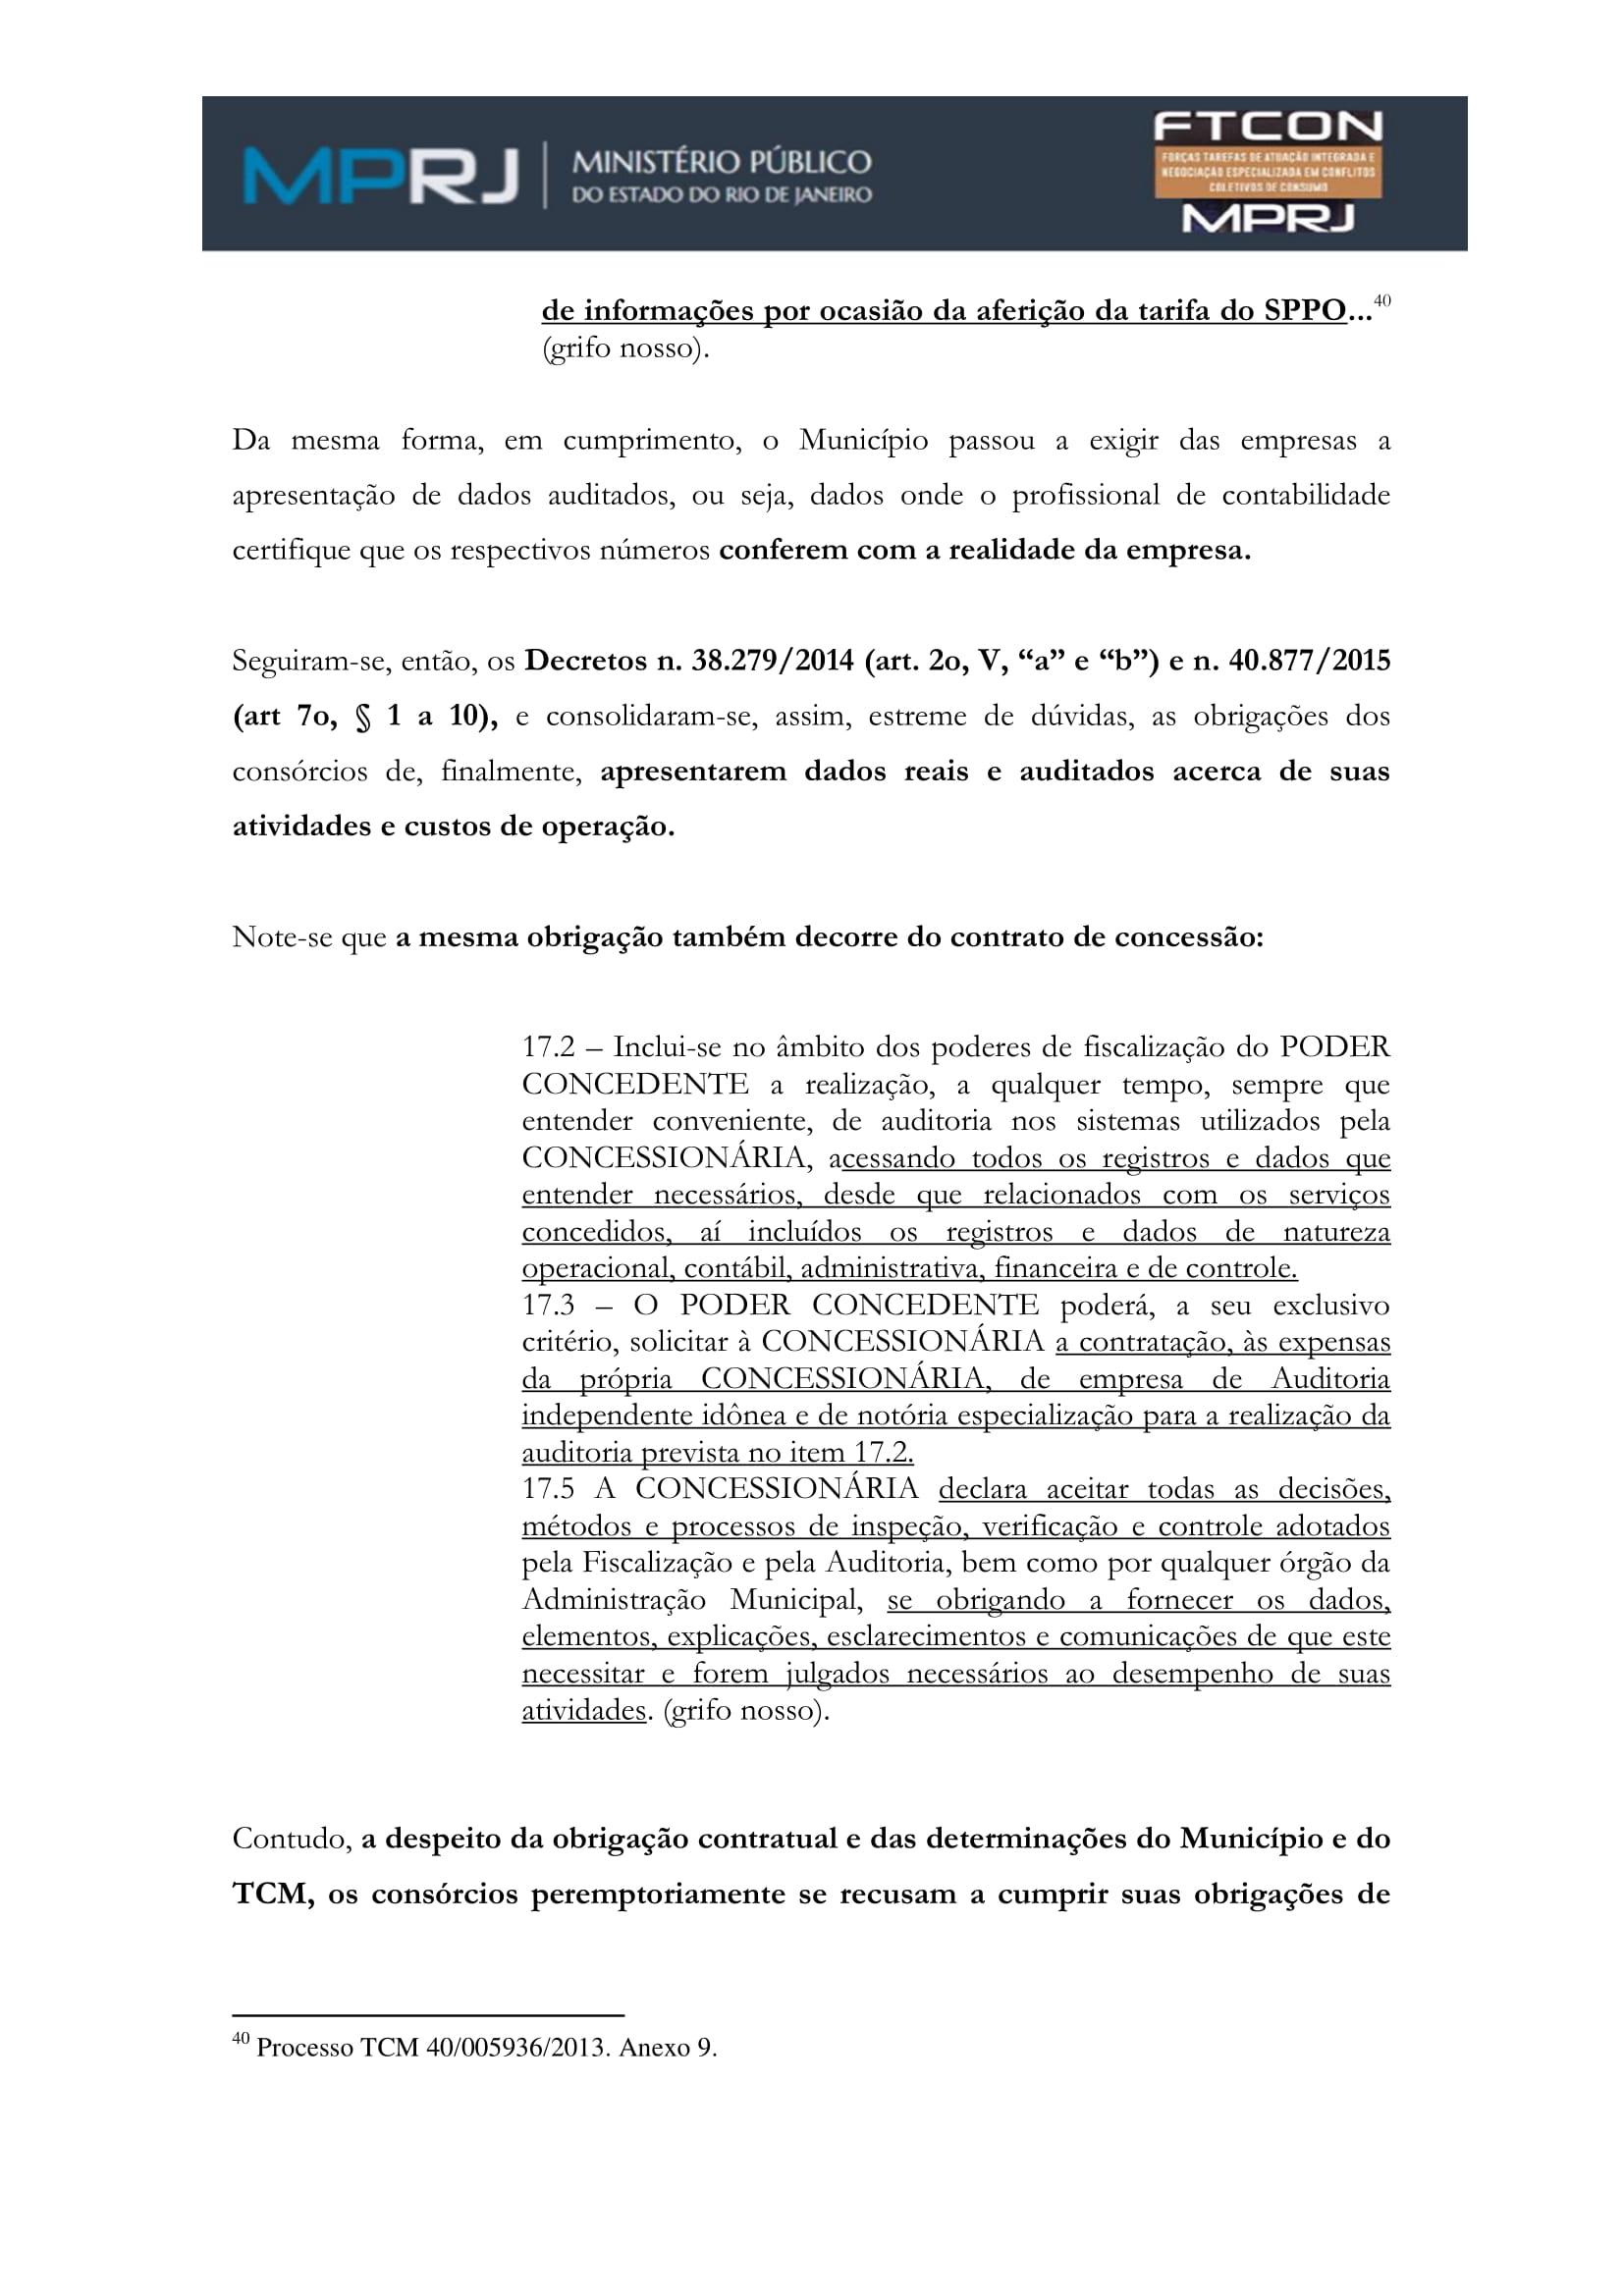 acp_caducidade_onibus_dr_rt-047